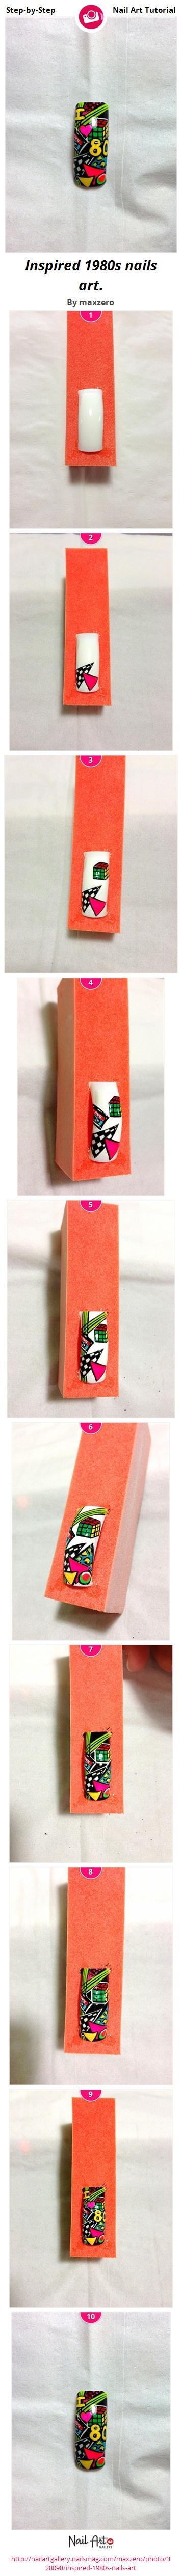 Inspired 1980s nails art. - Nail Art Gallery